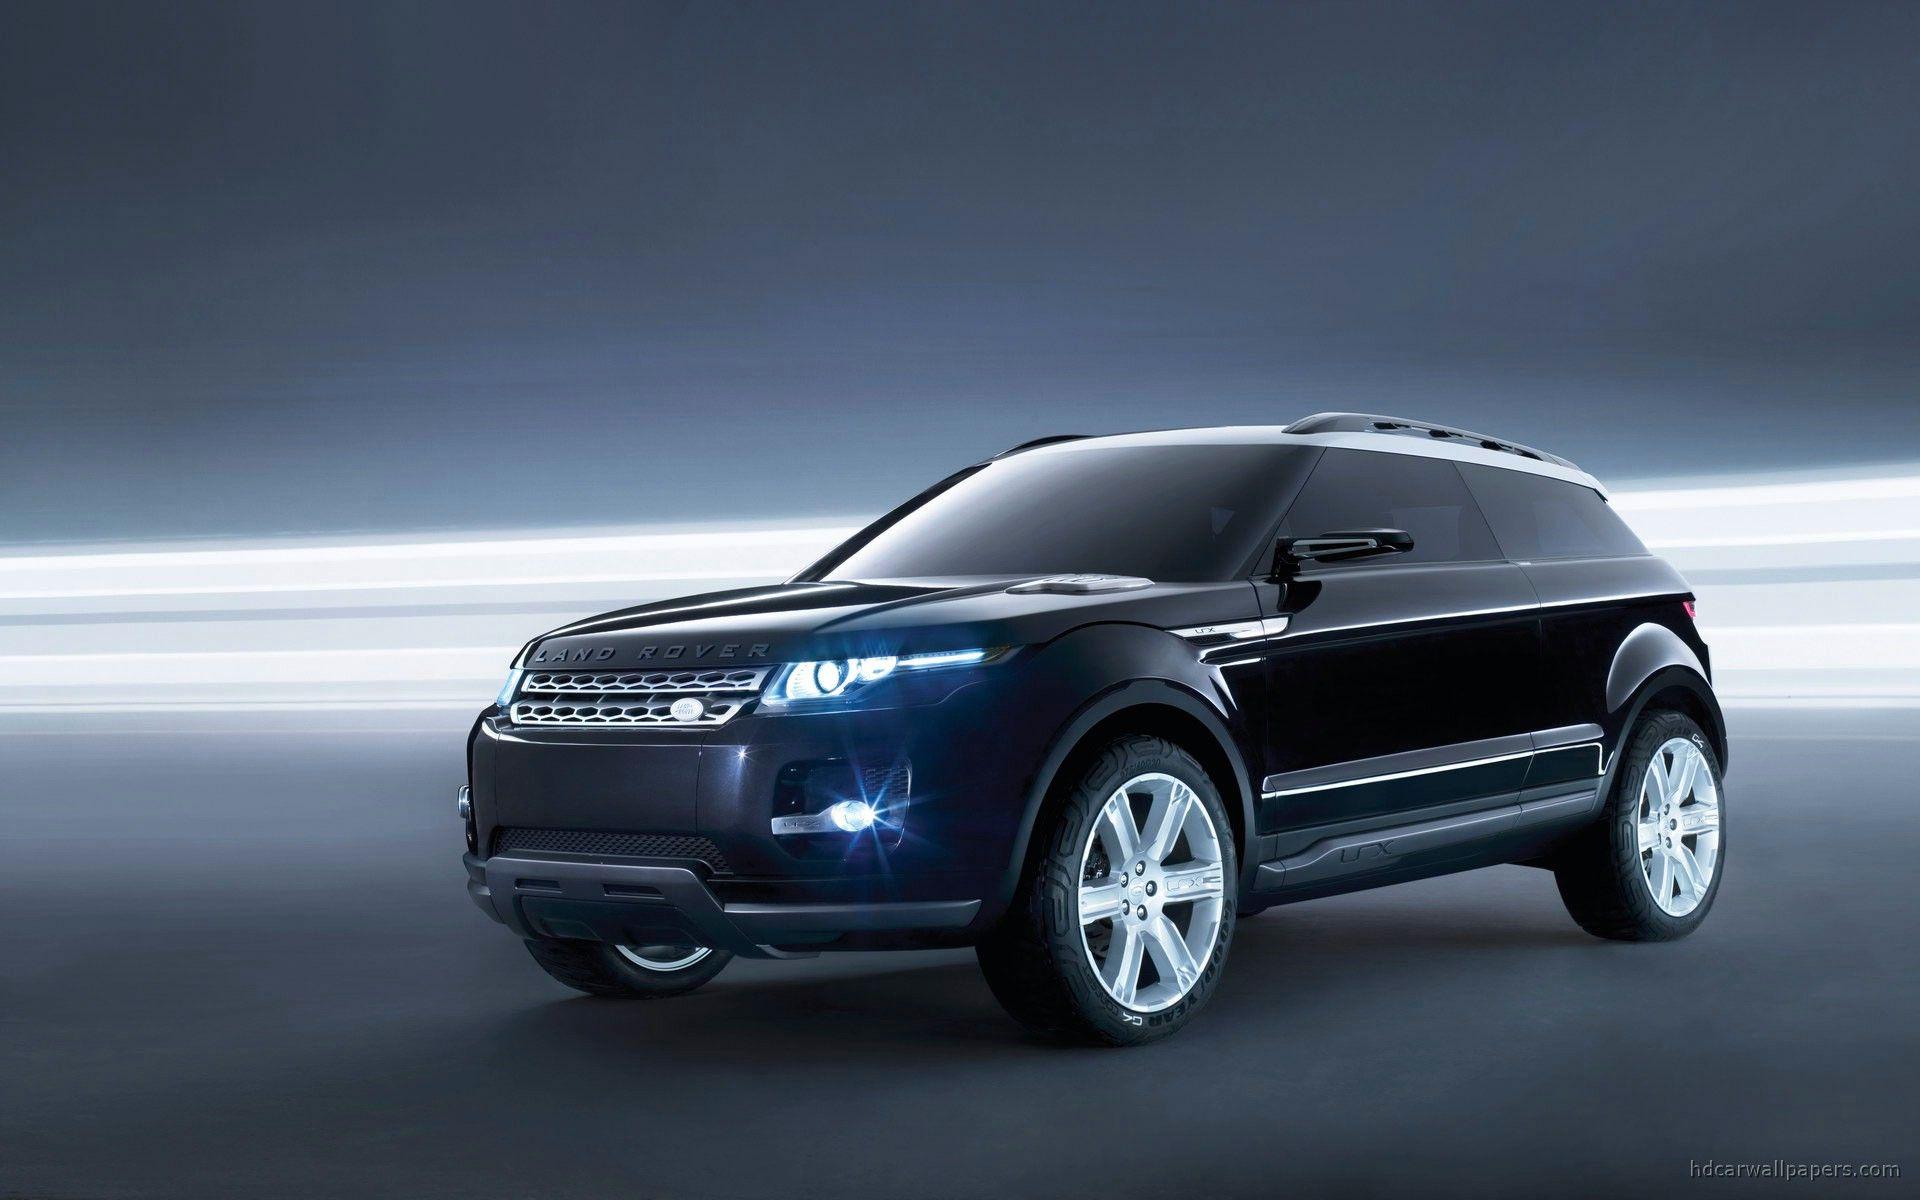 Land Rover Background Image Land Rover Range Rover Range Rover Black